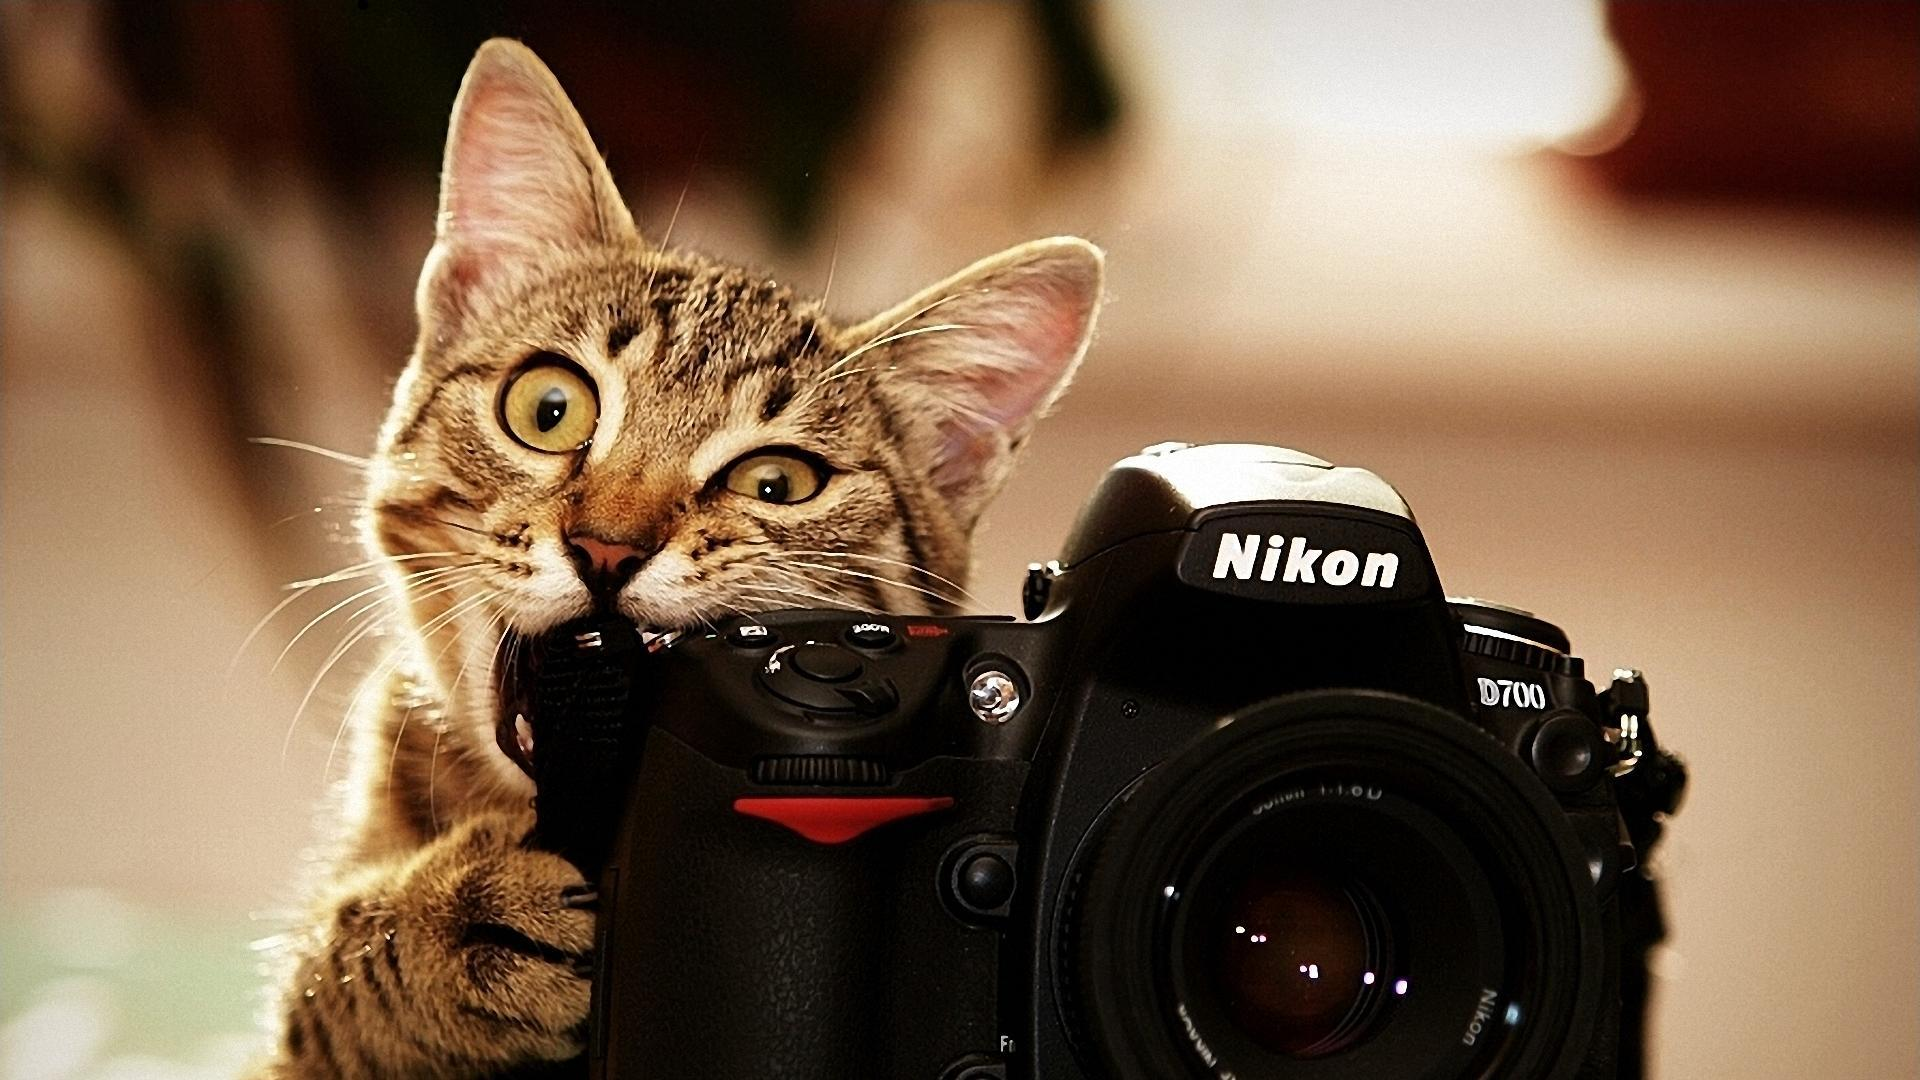 Say cheese! - Imgur